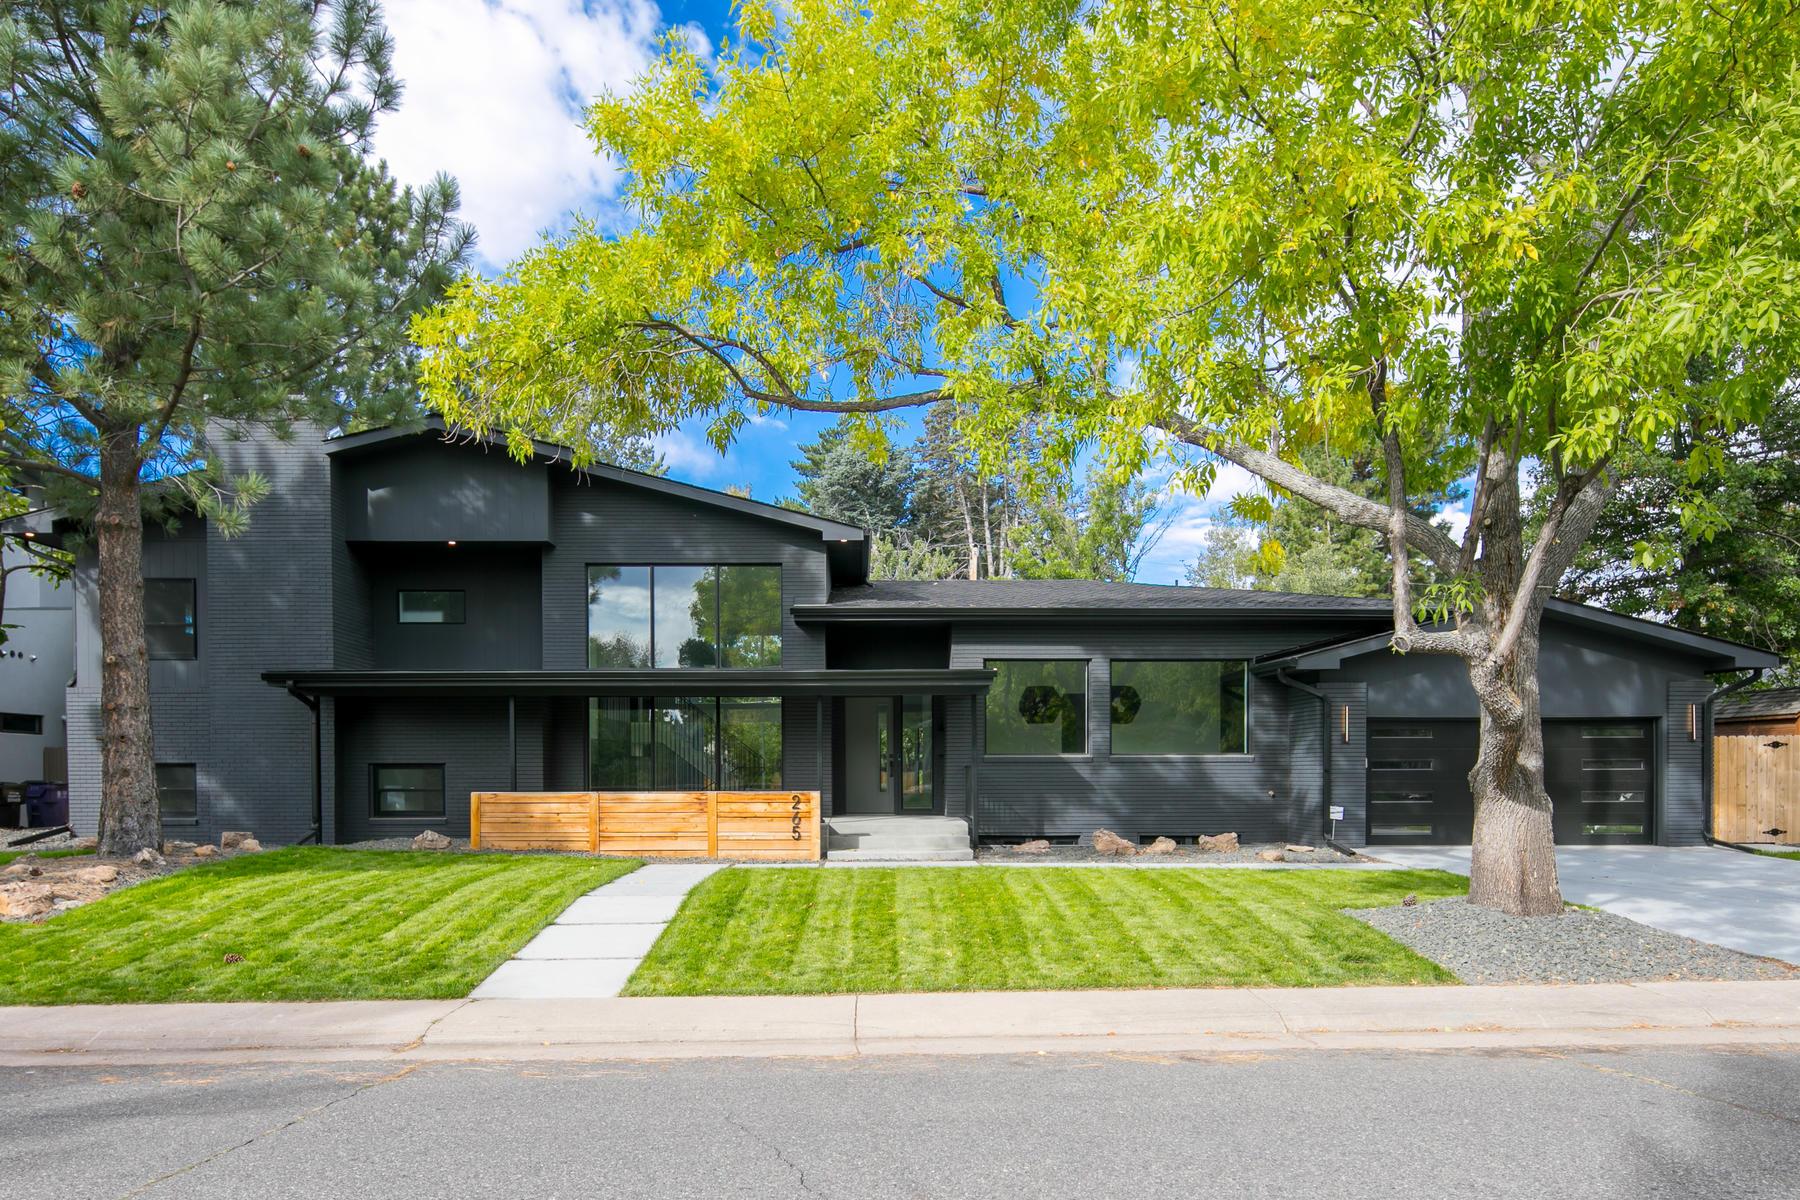 Property для того Продажа на Once You Enter This Custom Hilltop Home, You Won't Want to Leave 265 S Elm St, Denver, Колорадо 80246 Соединенные Штаты